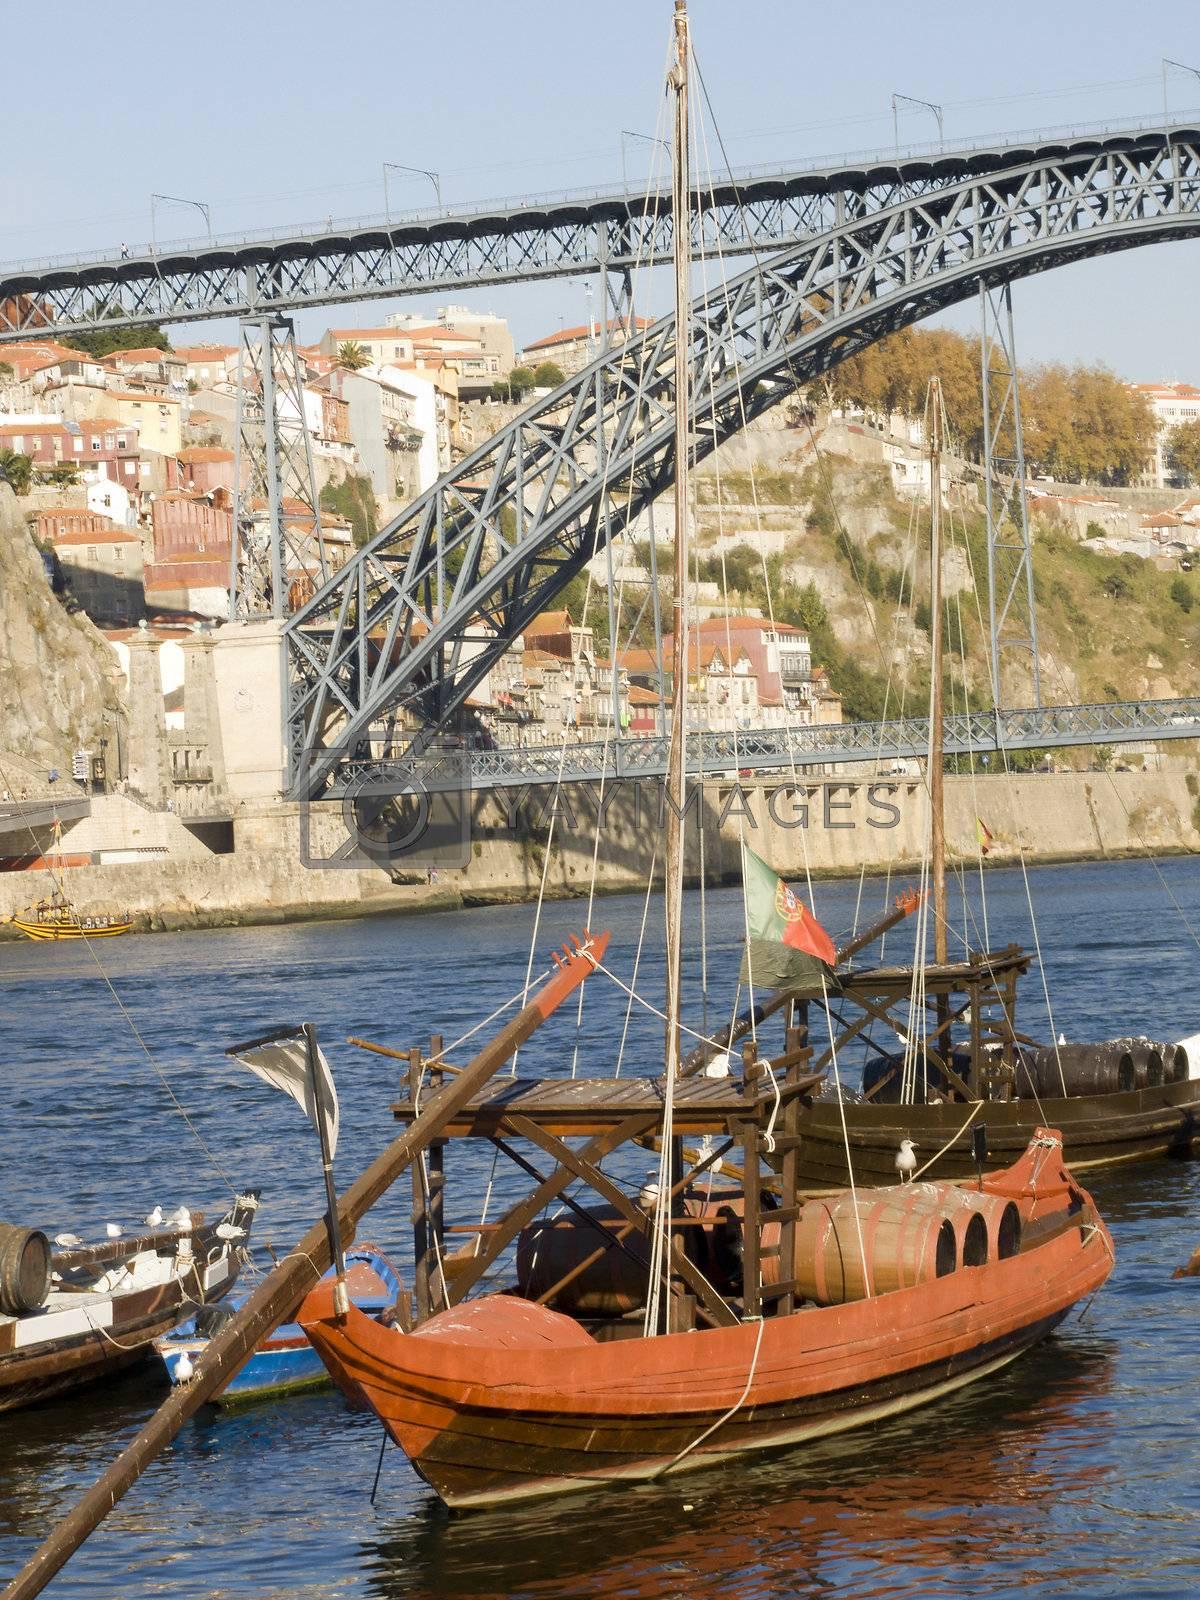 Tradicional rebelo boat by PauloResende